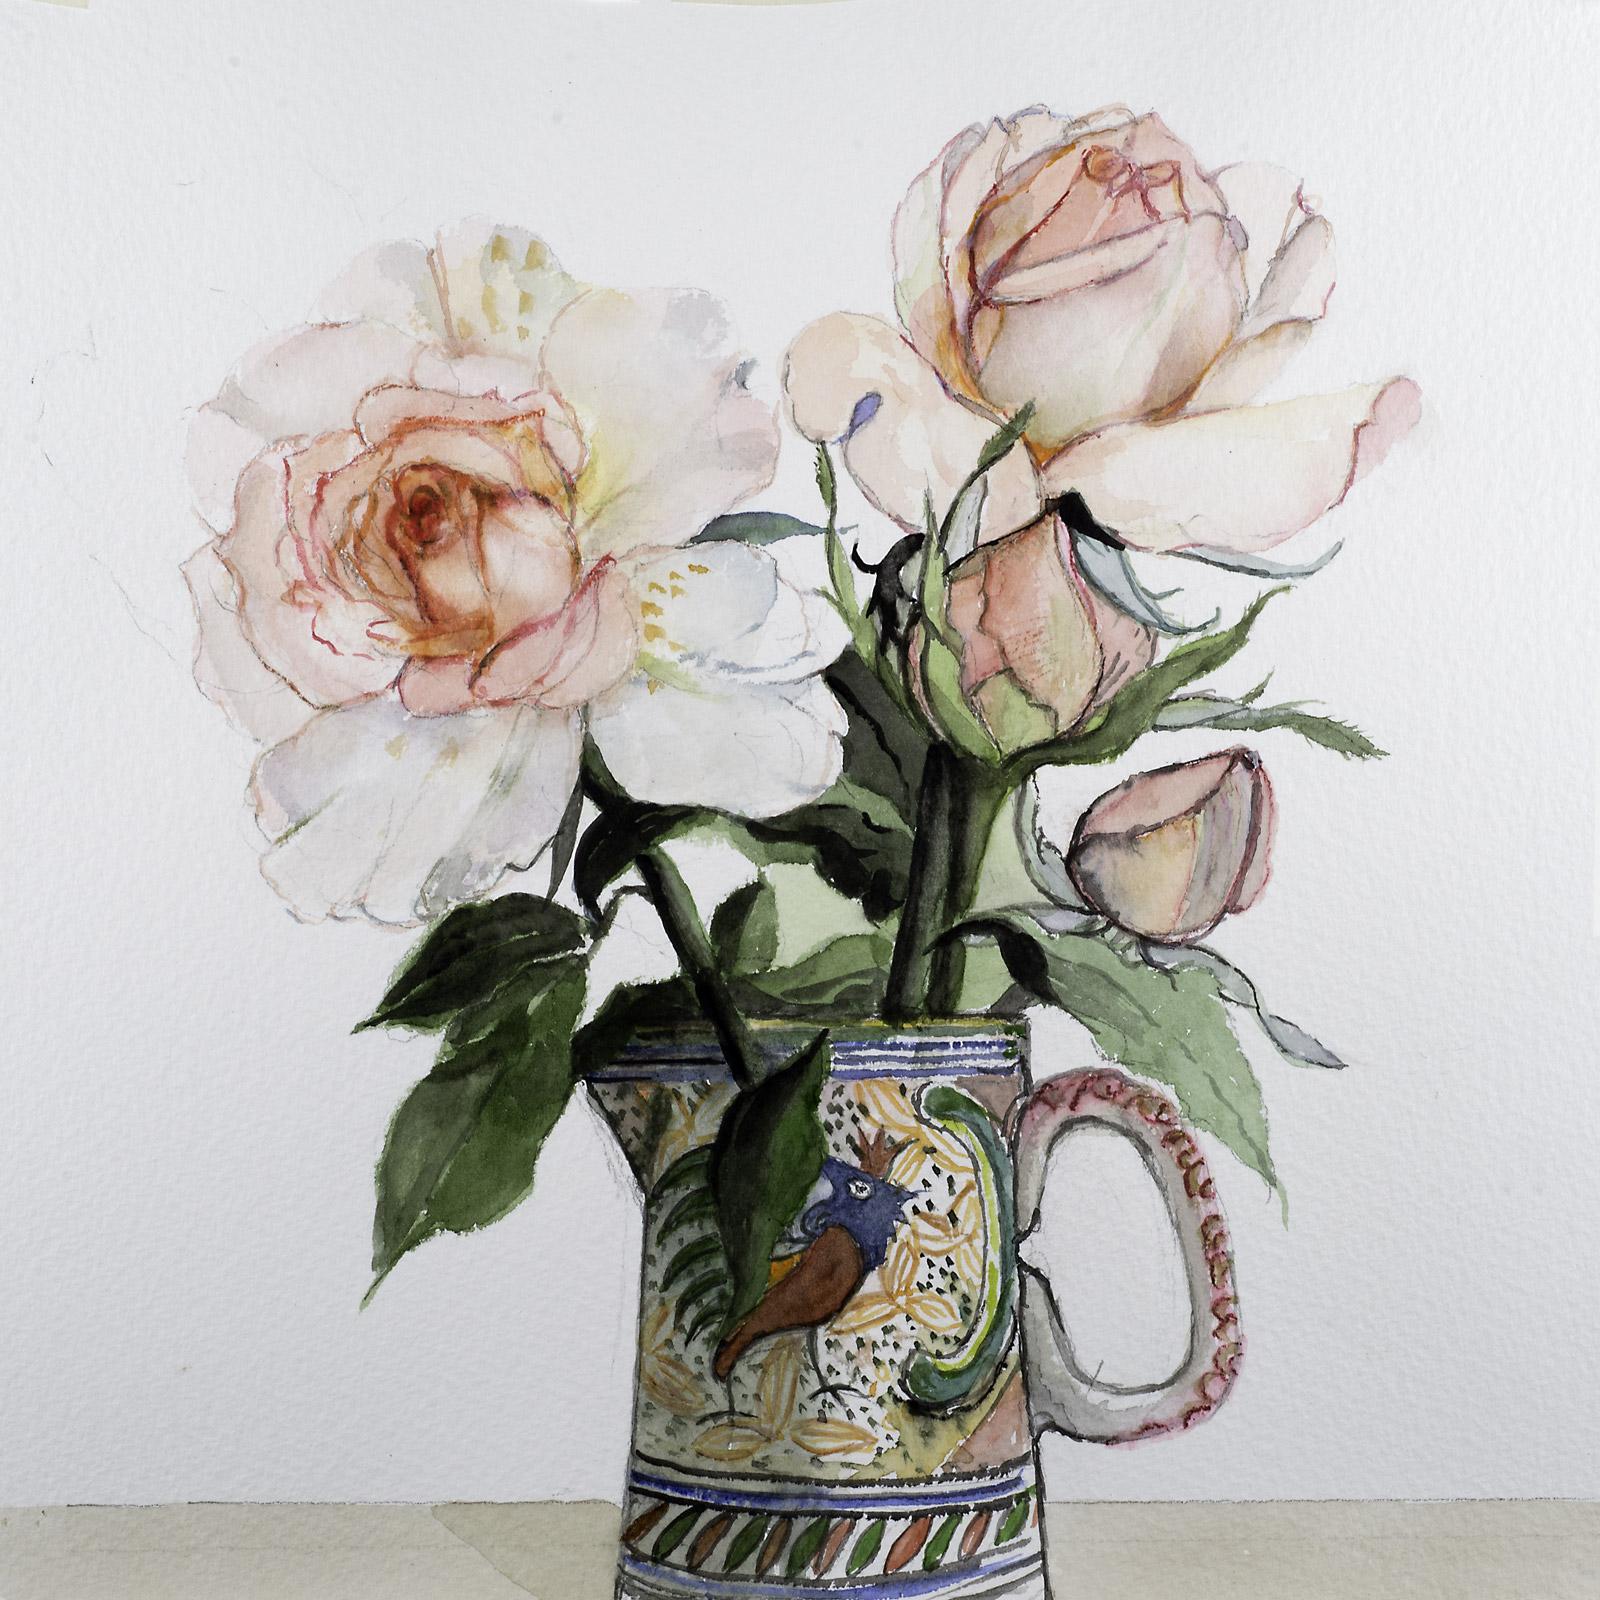 Chandos-Beauty-in-Portuguese-Vase